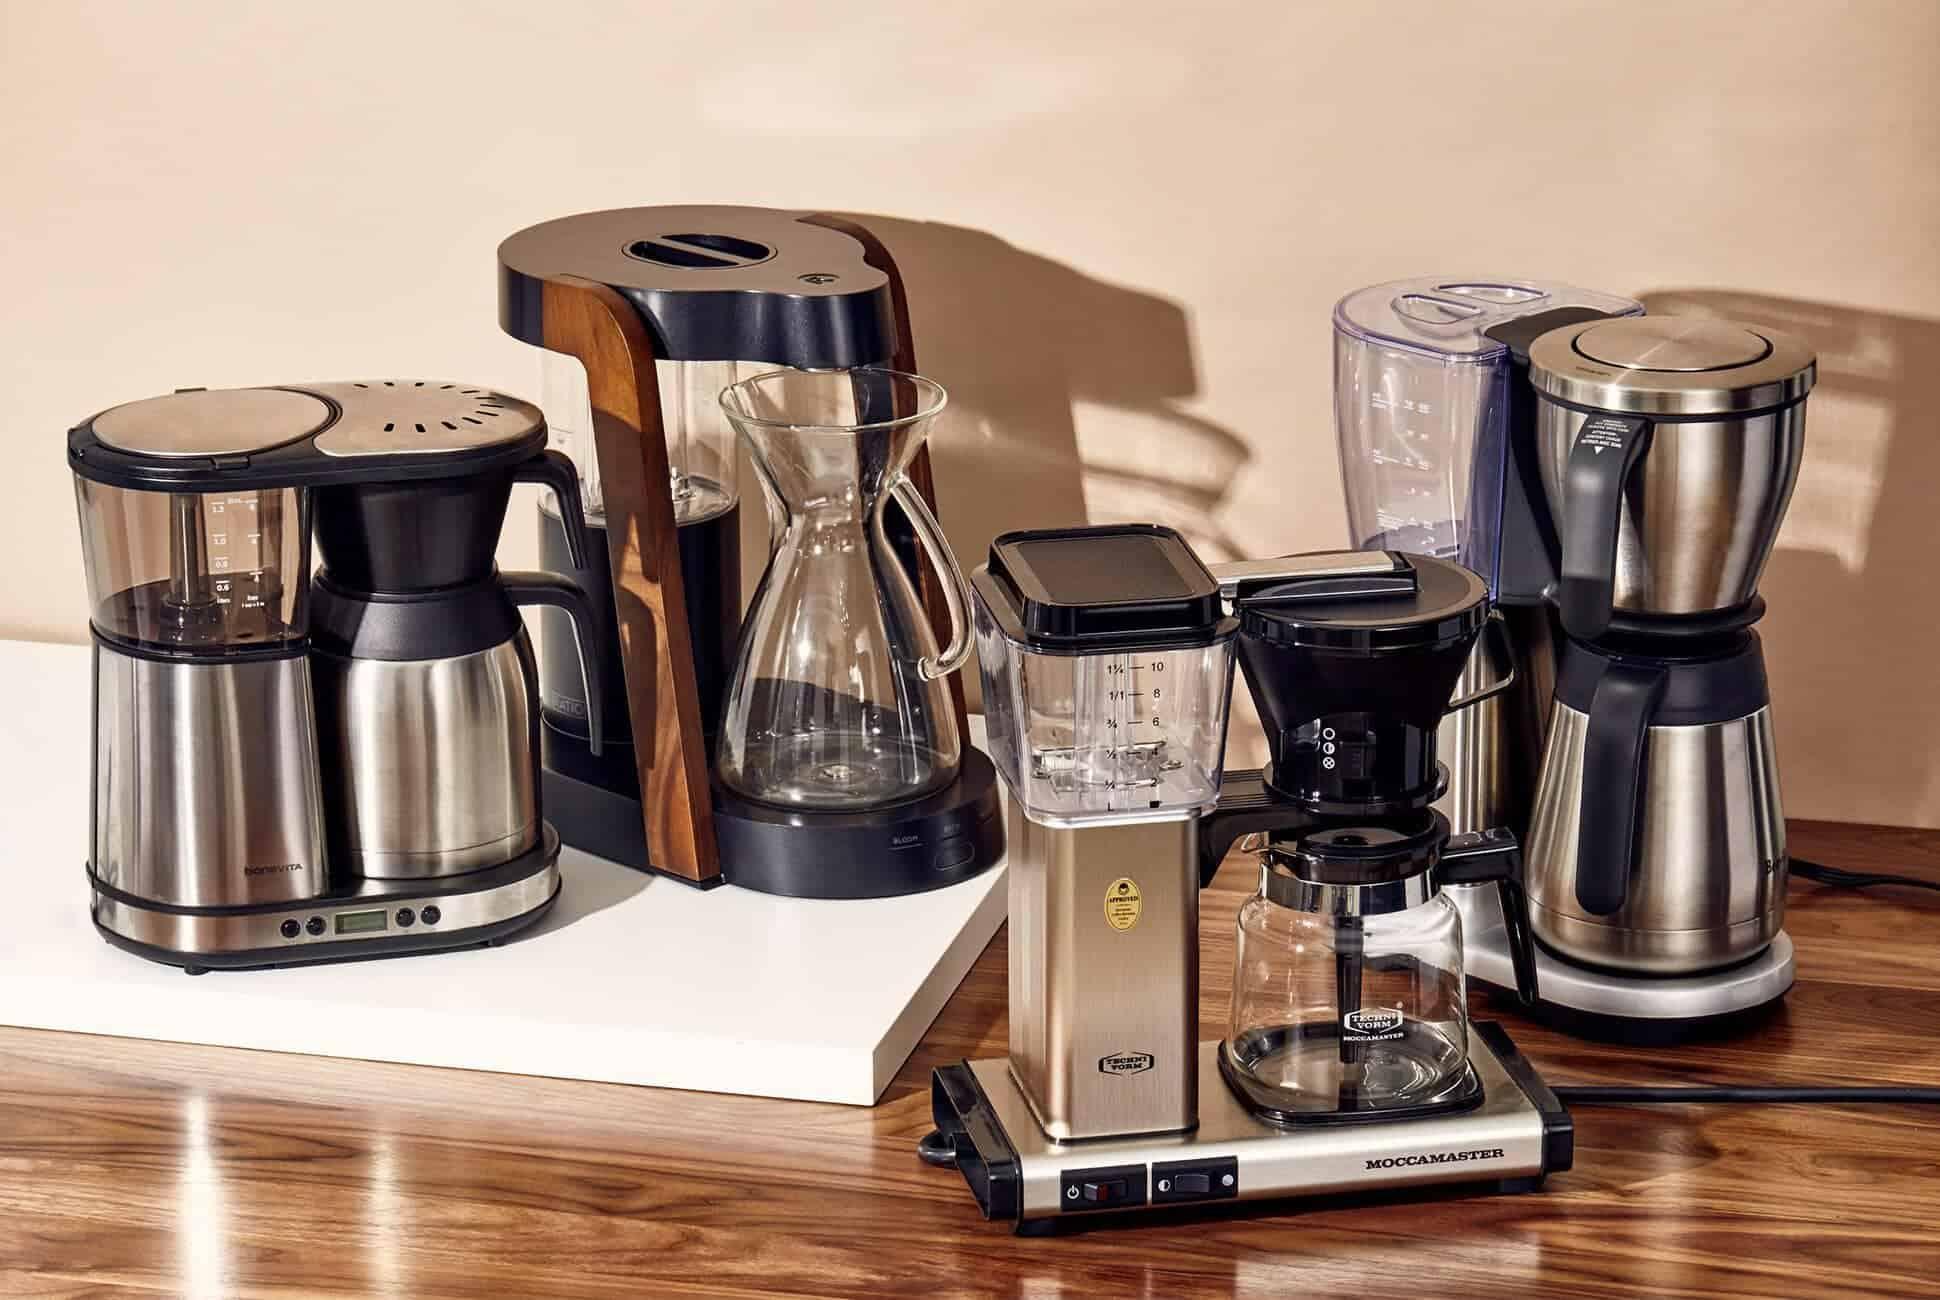 Best home coffee maker gadgets